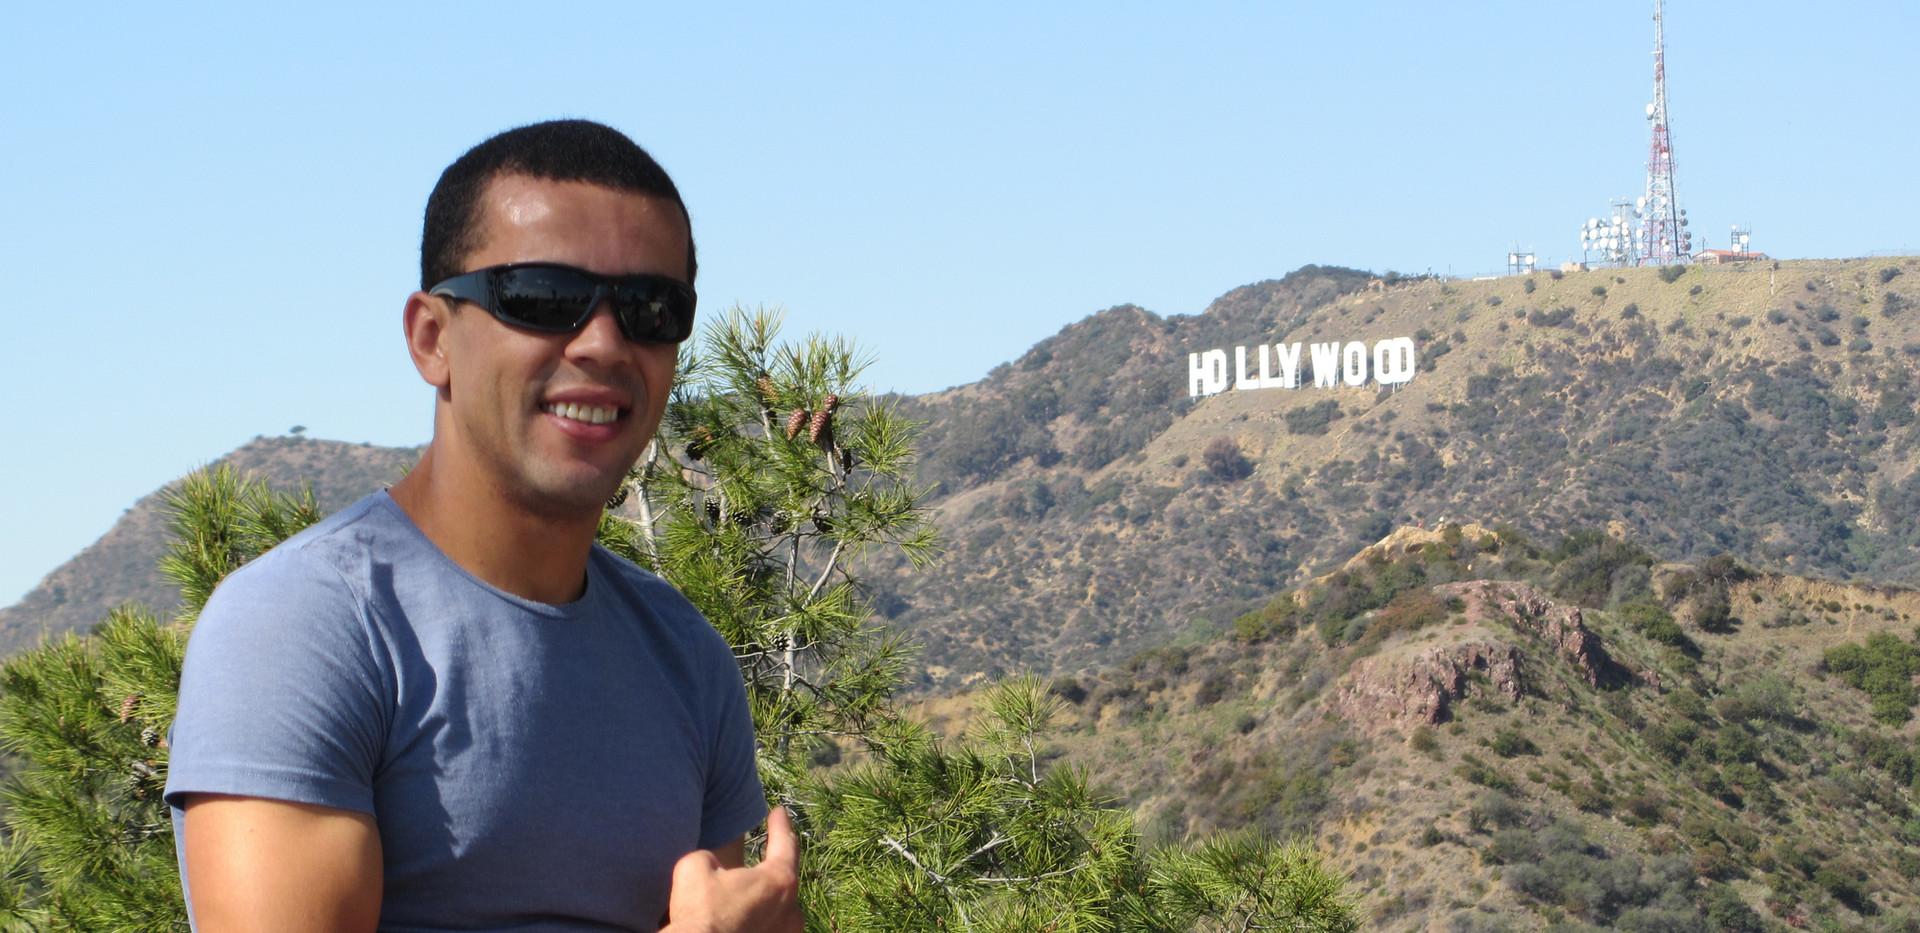 Hollywood-Los Angeles.JPG